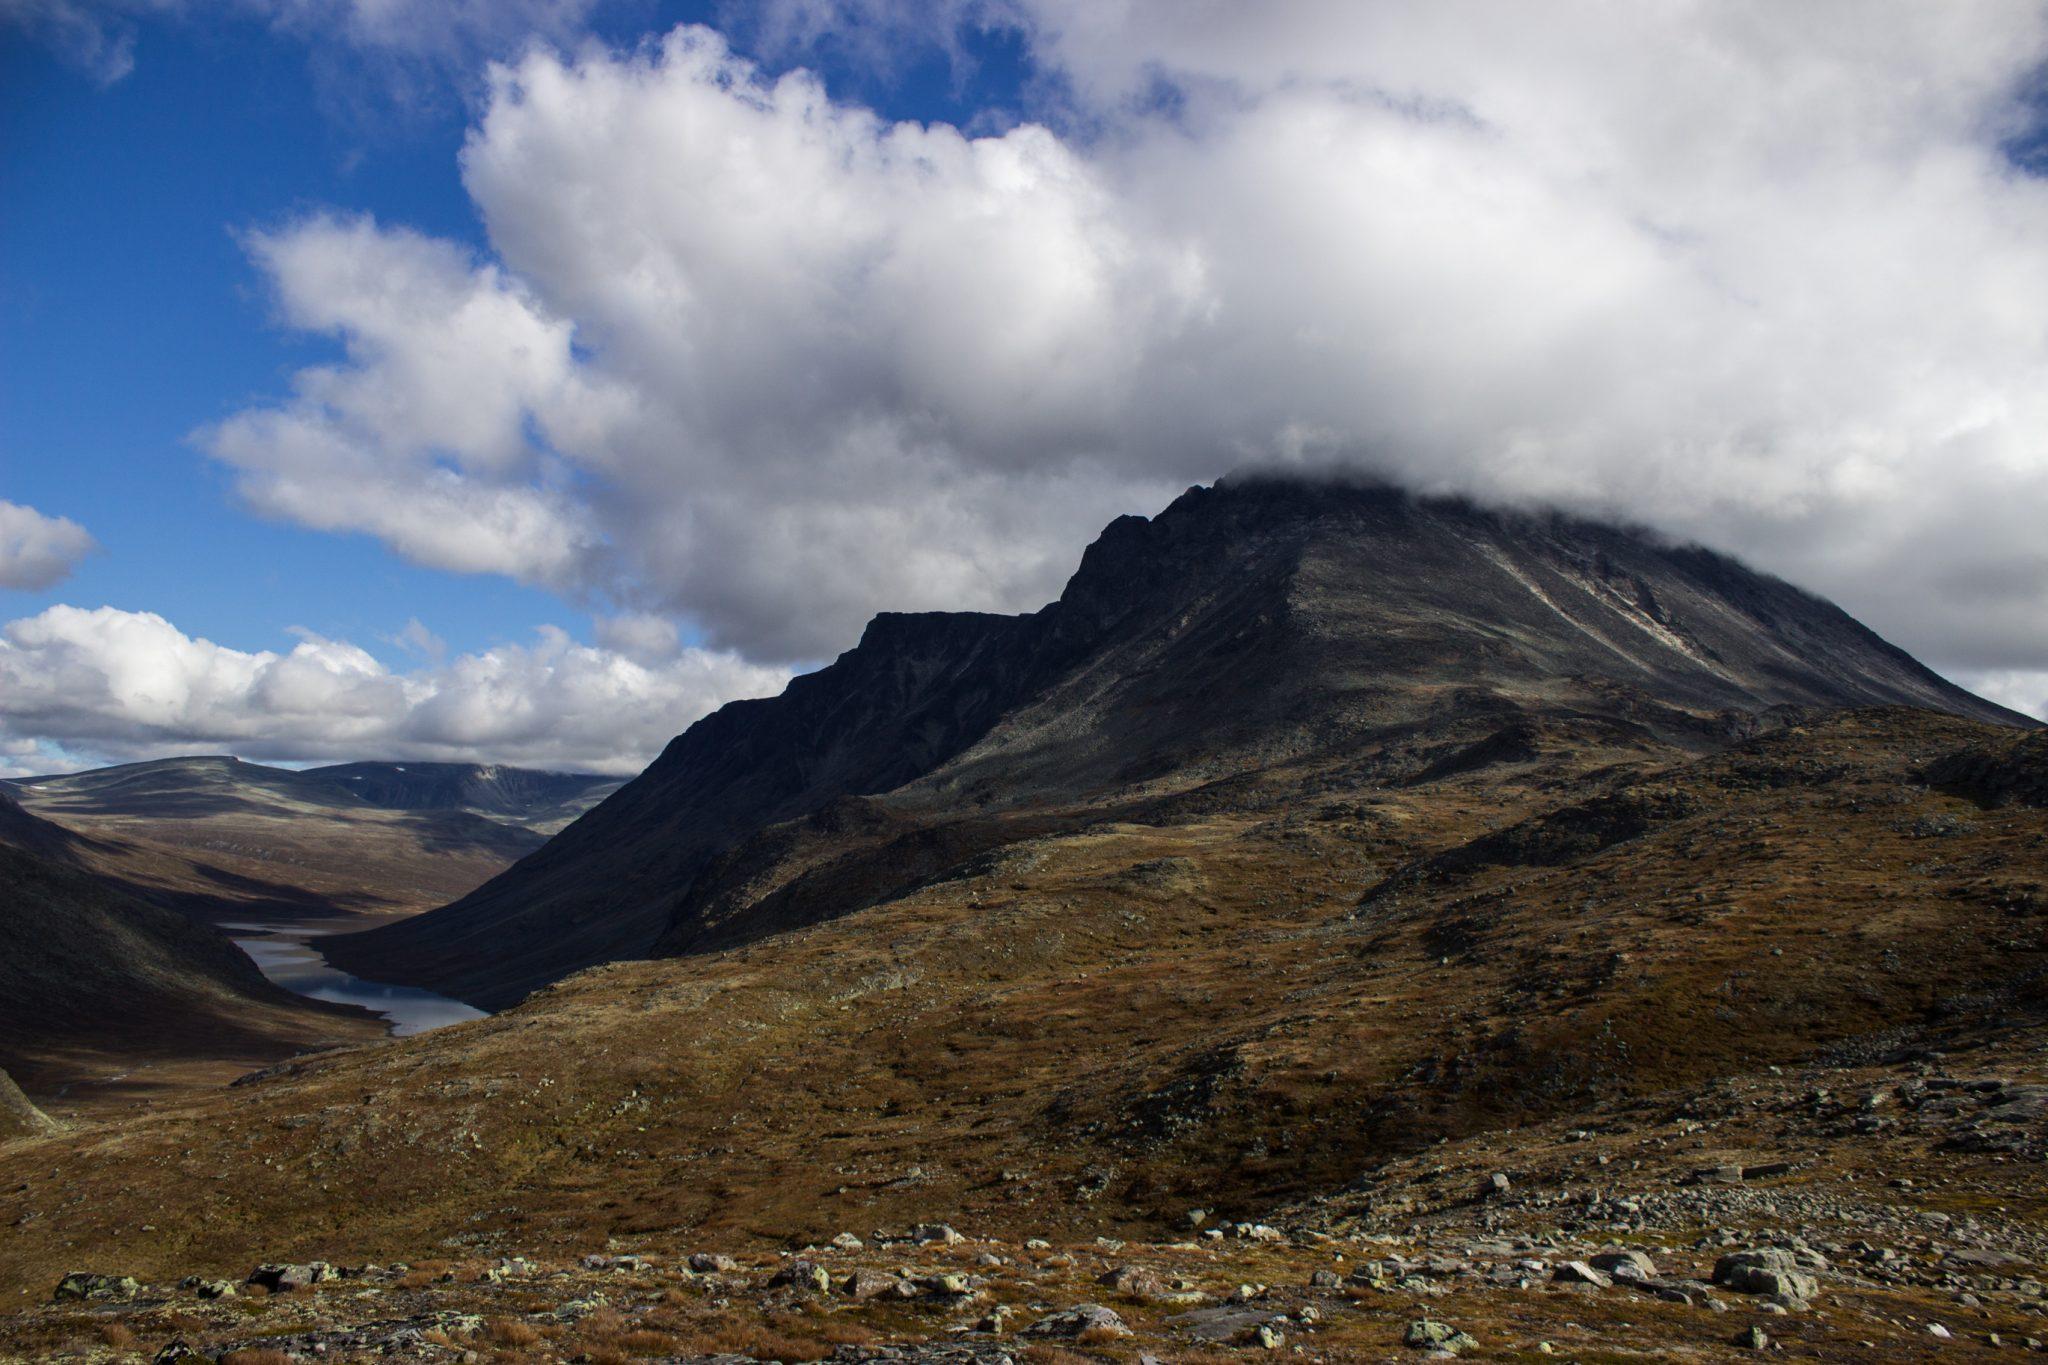 Wanderung Besseggen-Grat im Jotunheimen Nationalpark, traumhafte Landschaft, teils karge Fluß- und Berglandschaft